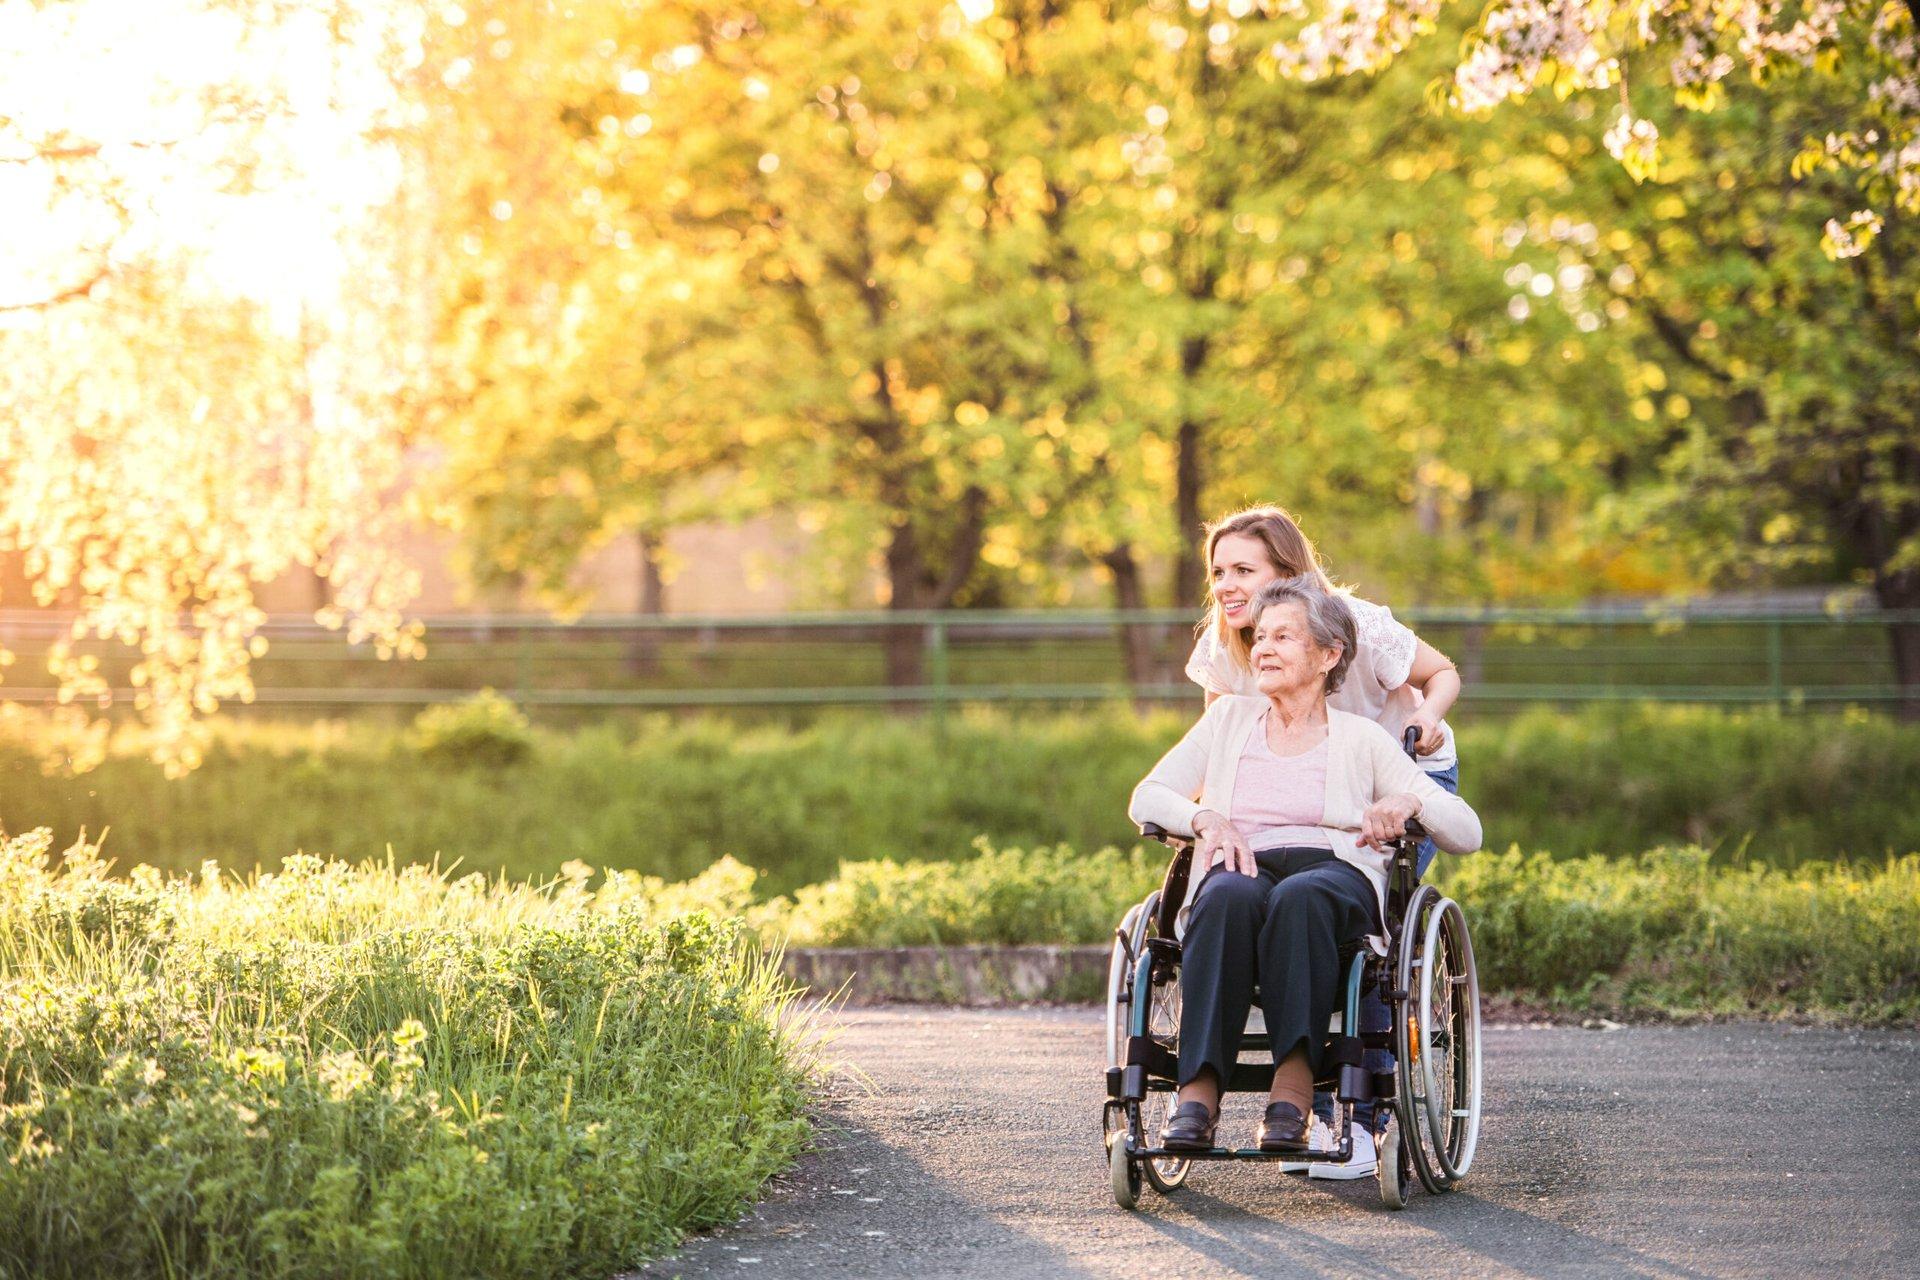 Senior in a wheelchair enjoying the outdoors